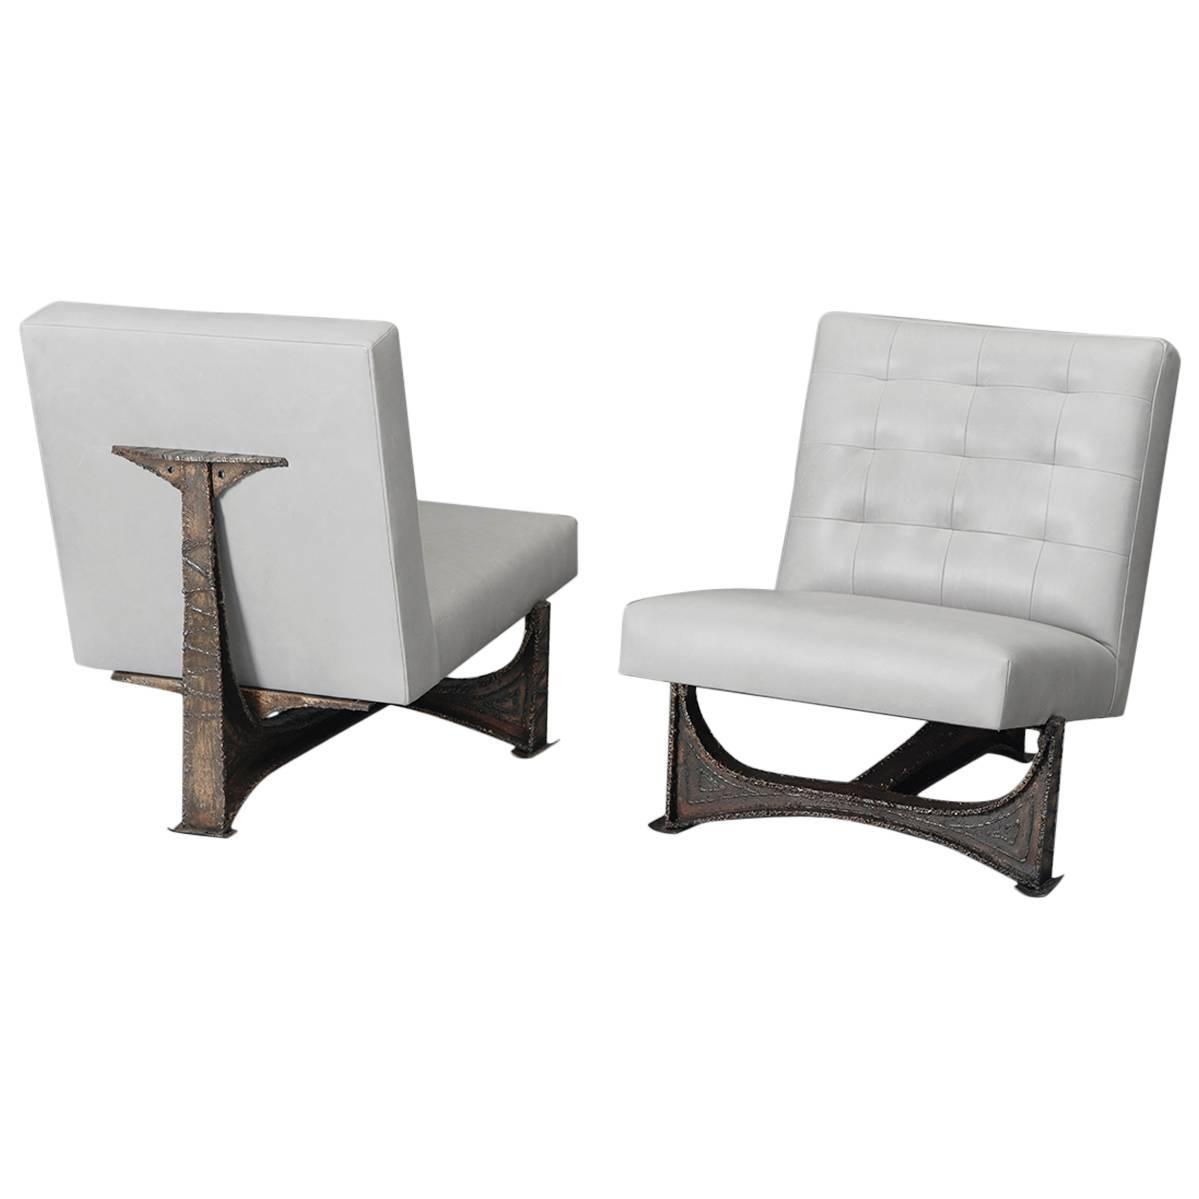 Paul Evans Pair of Welded Steel Chairs USA circa 1965